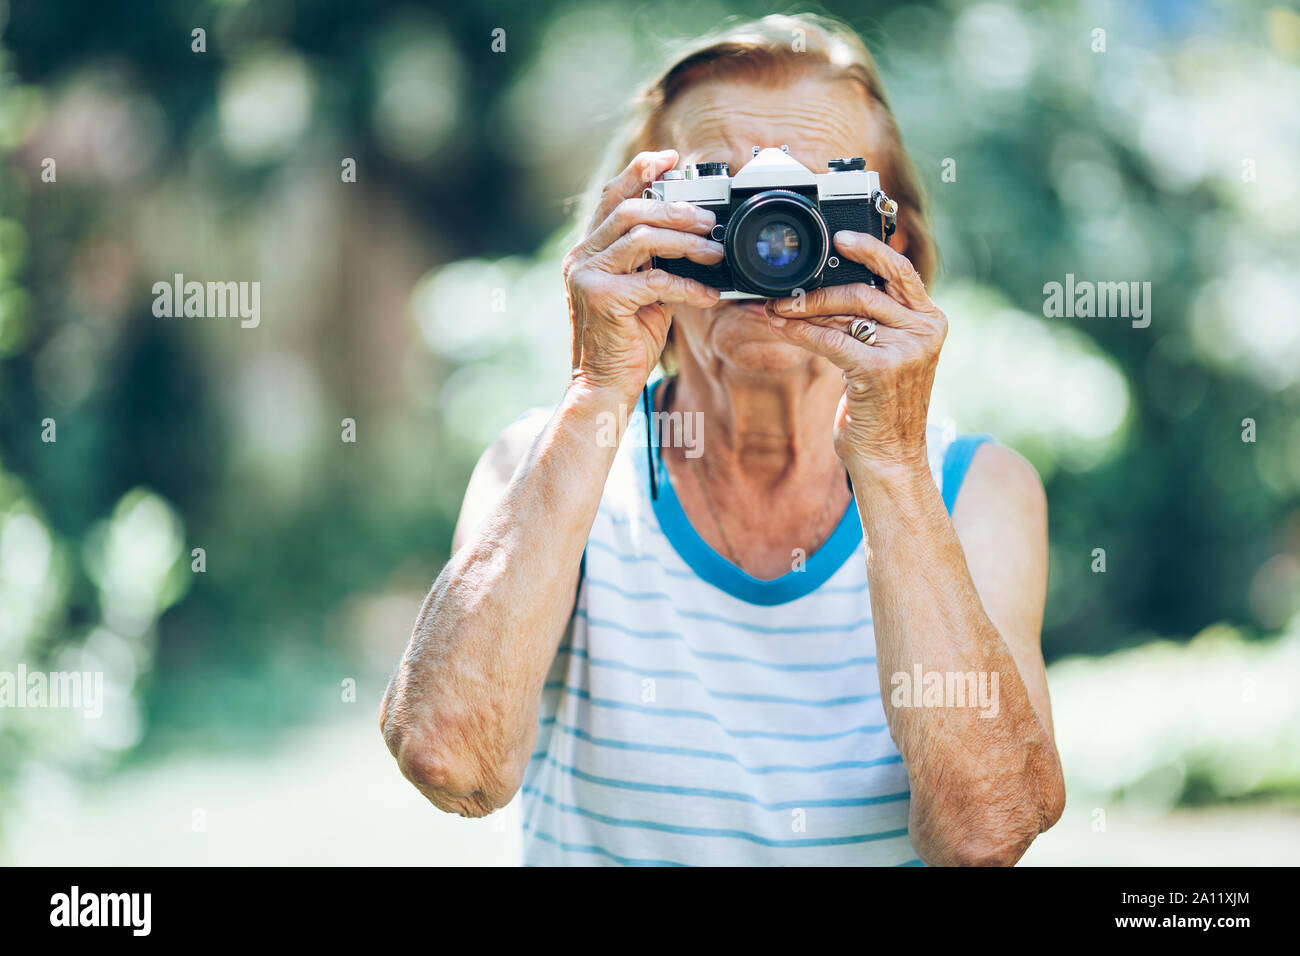 Ältere Frau mit einem Vintage film Foto Kamera Stockfoto